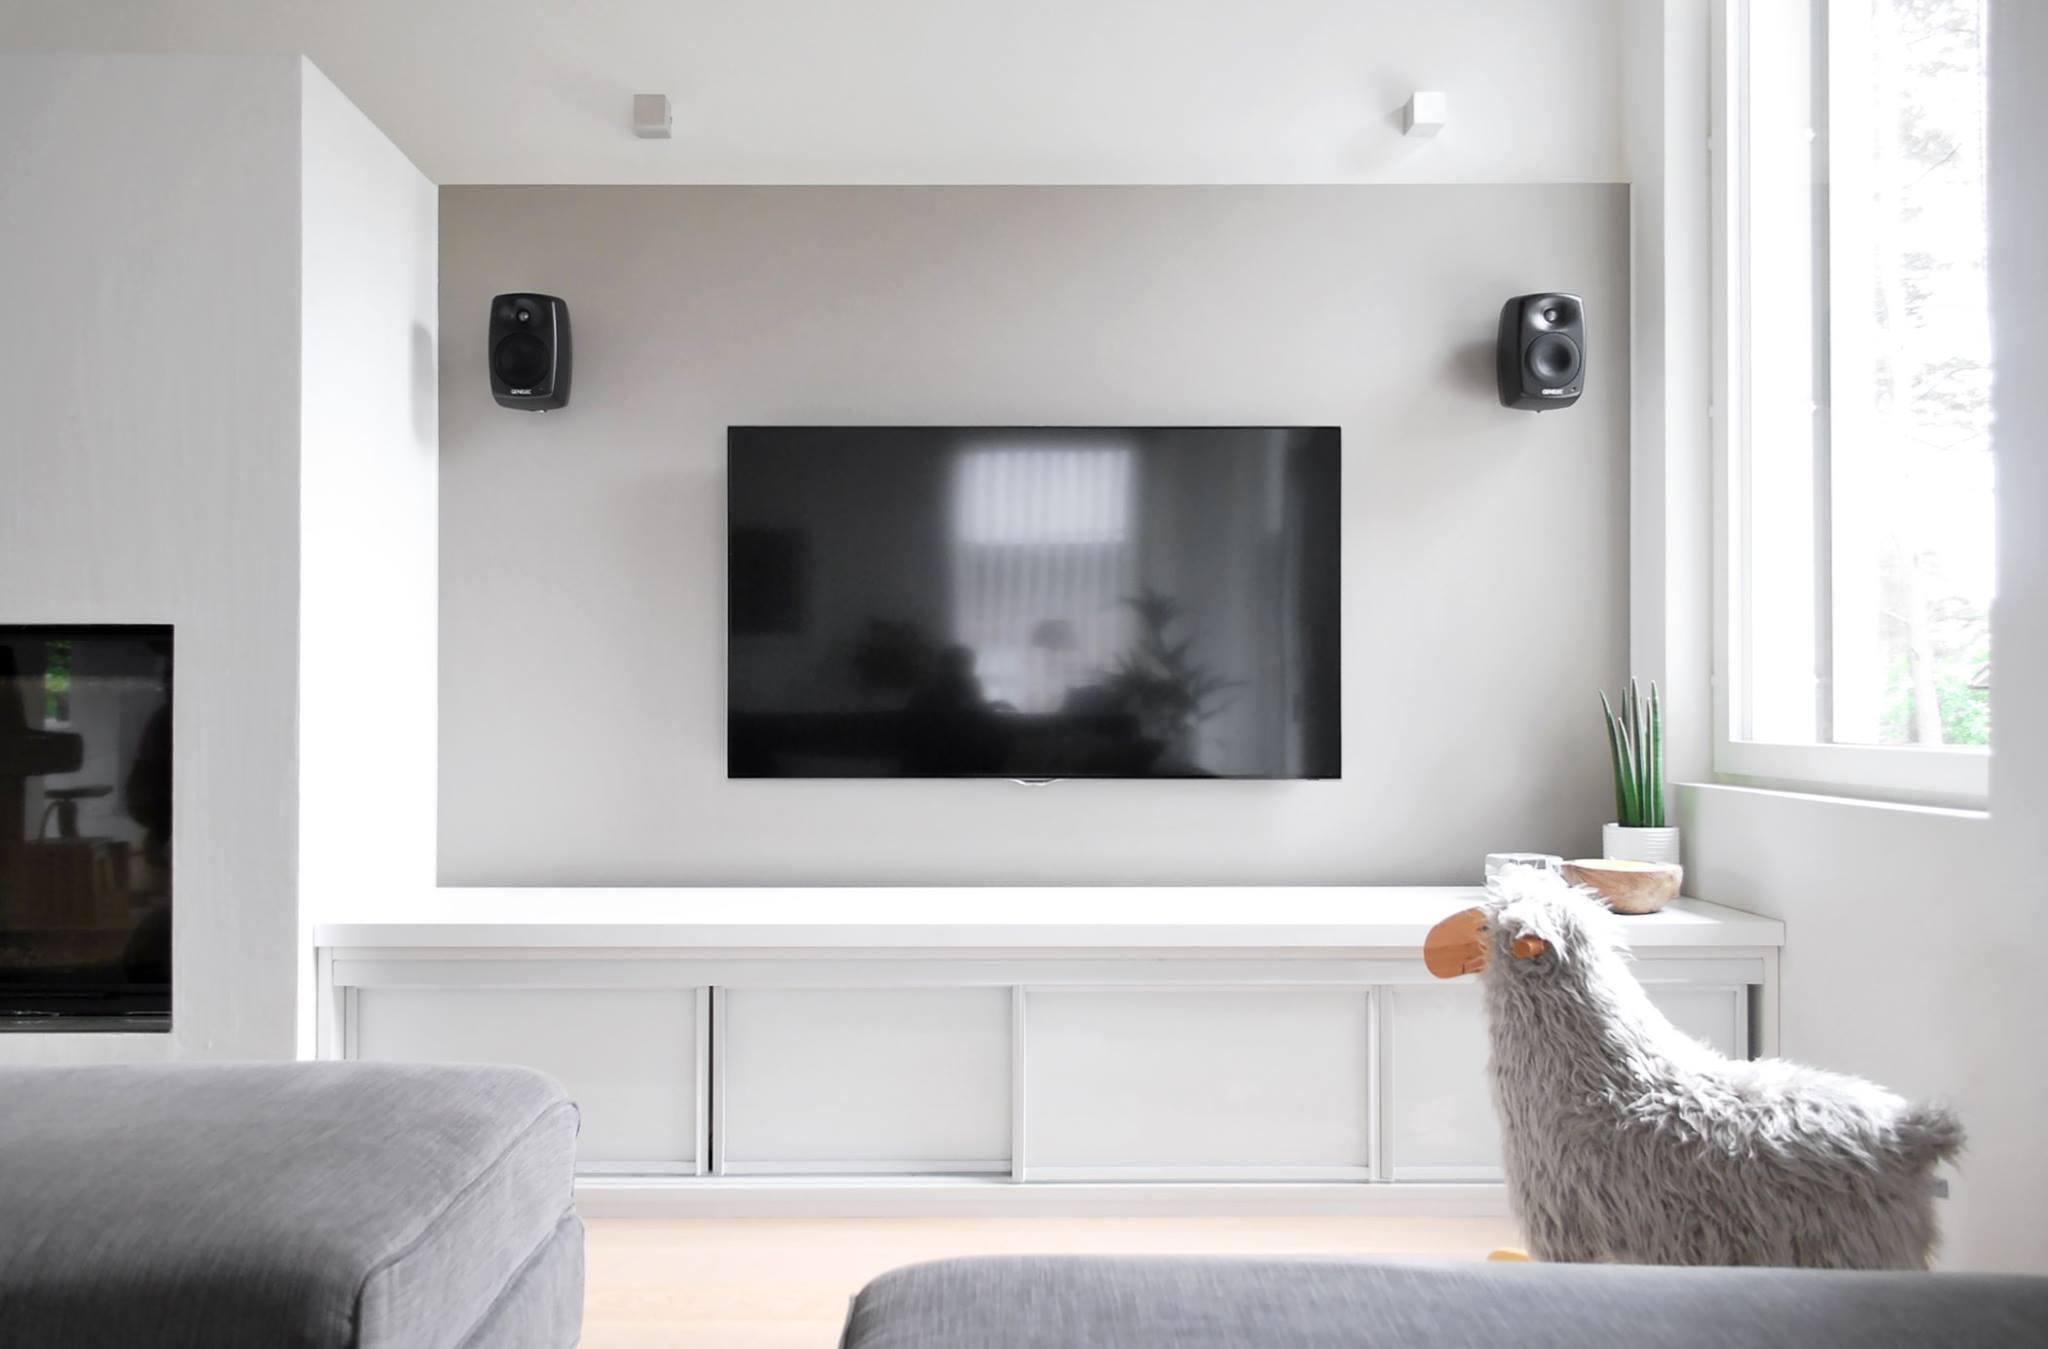 moderni-kivitalo-tv-taso